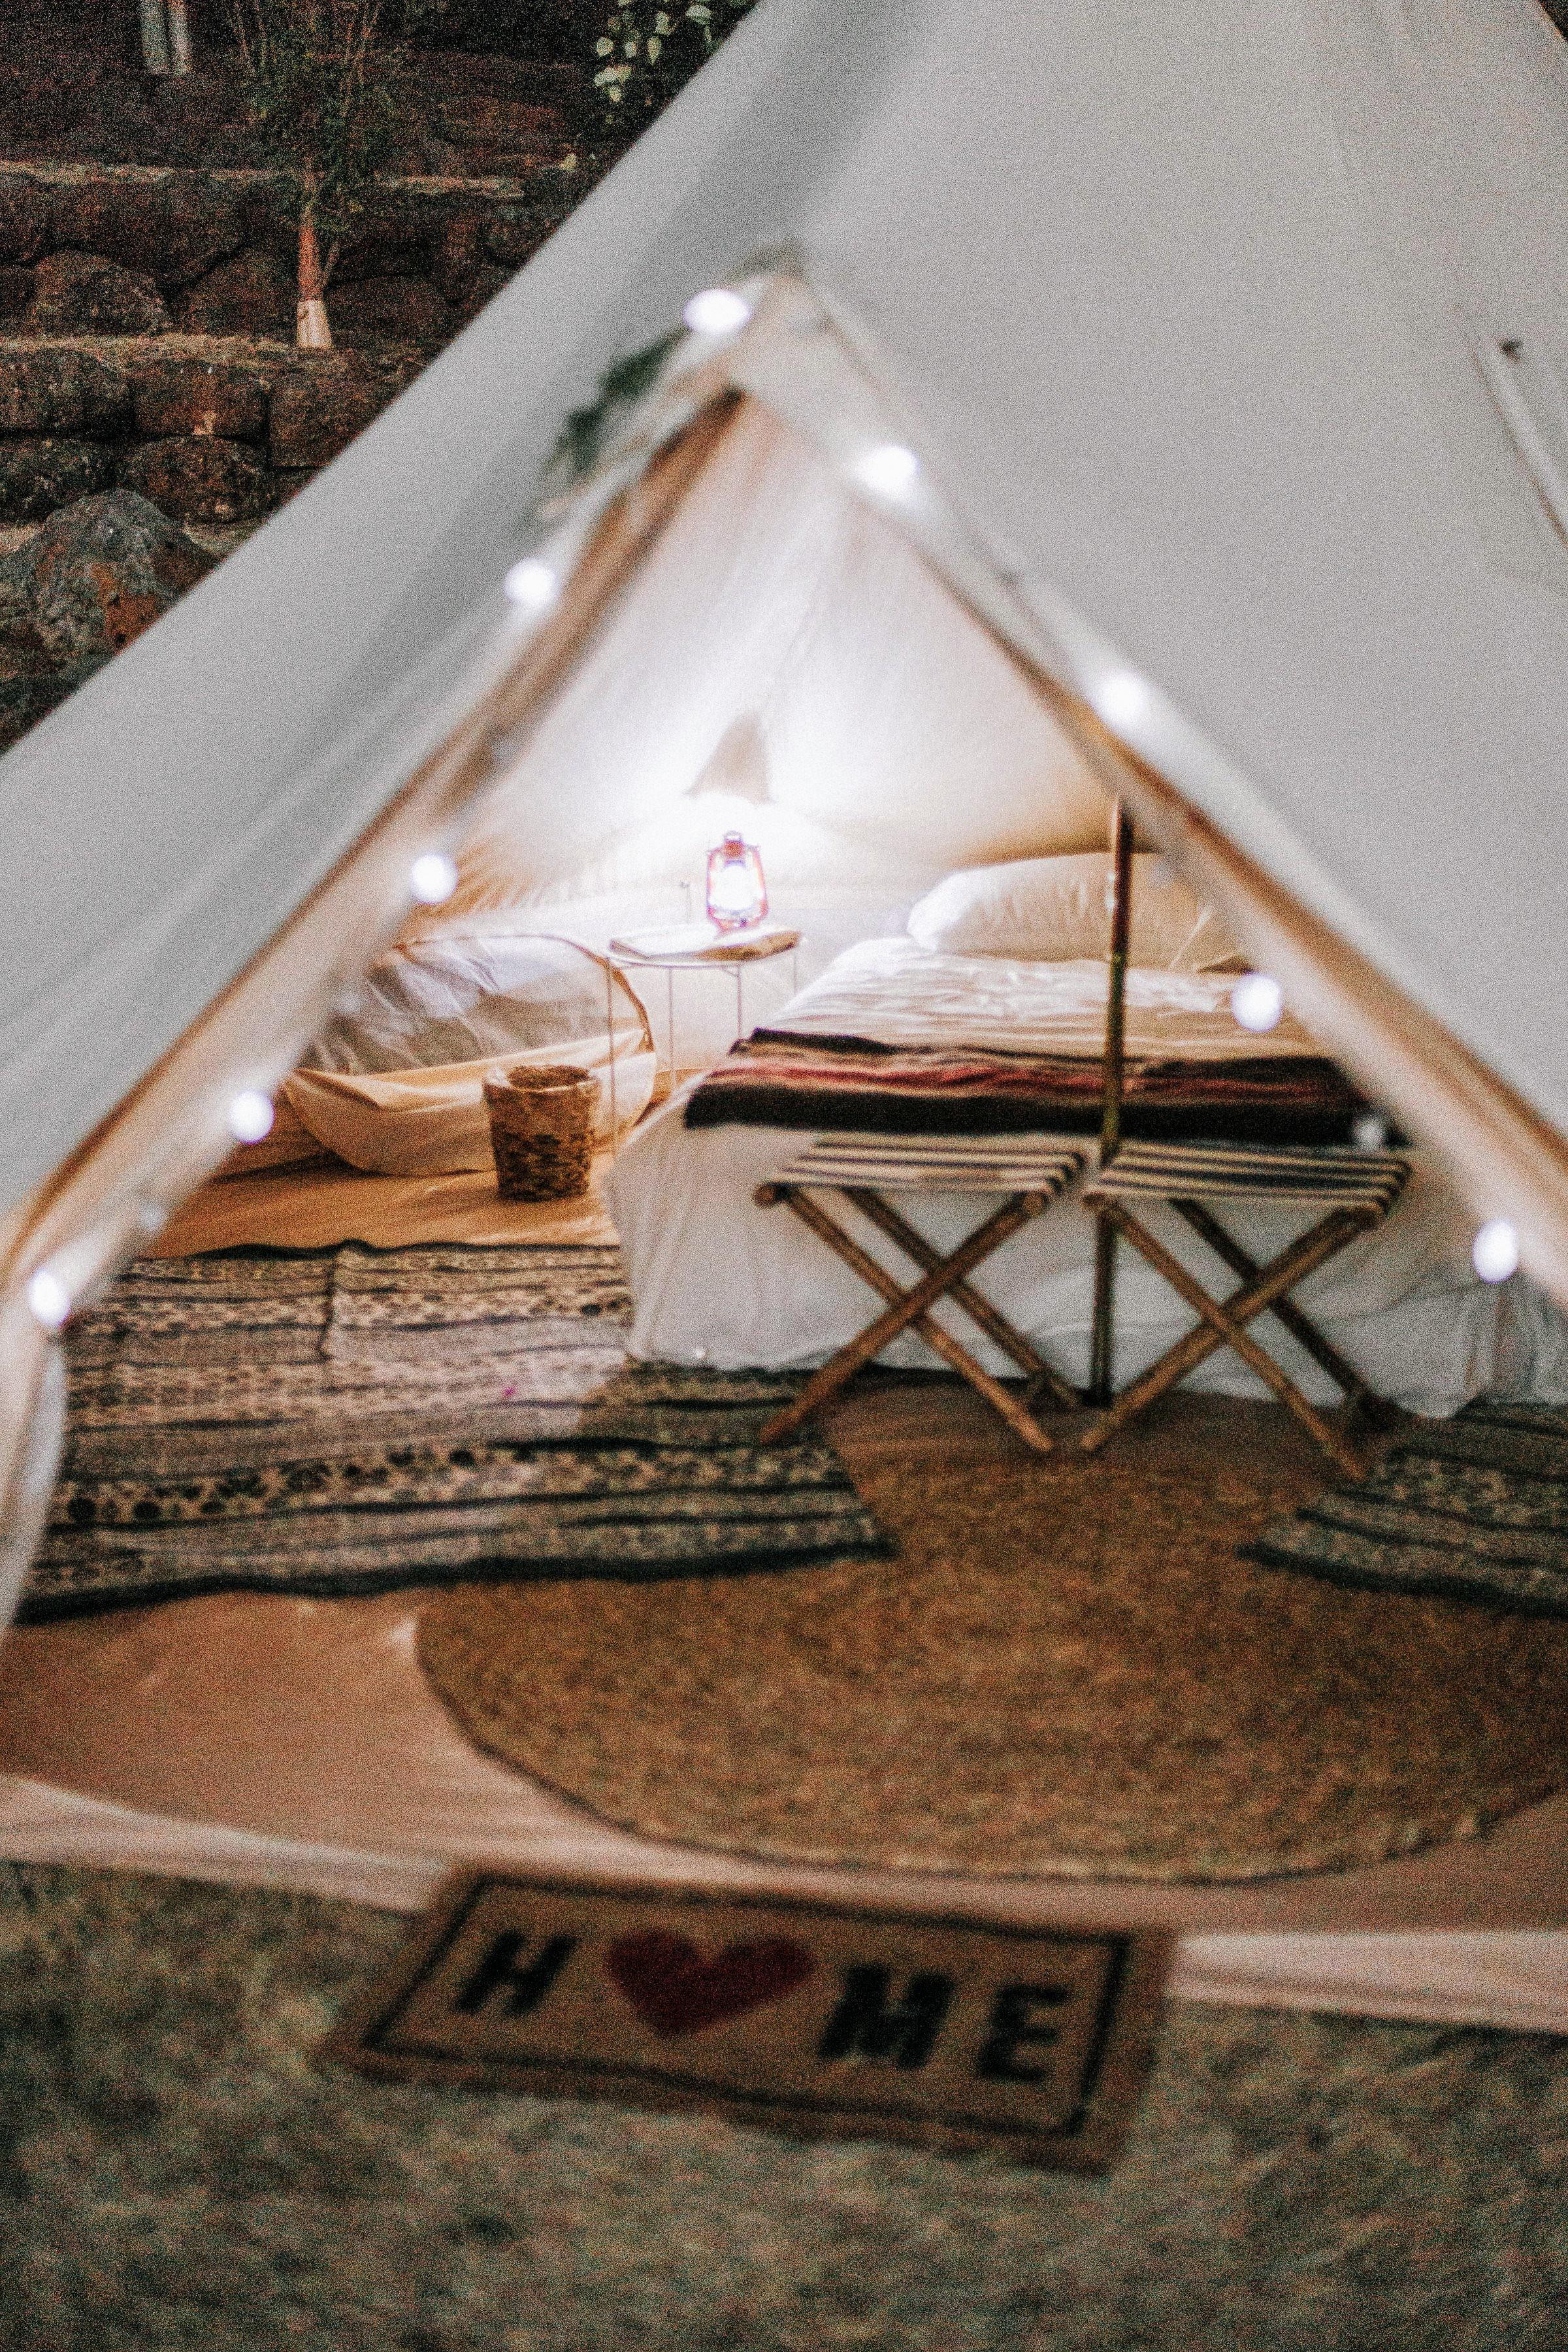 glamping tent at night - Life inTents